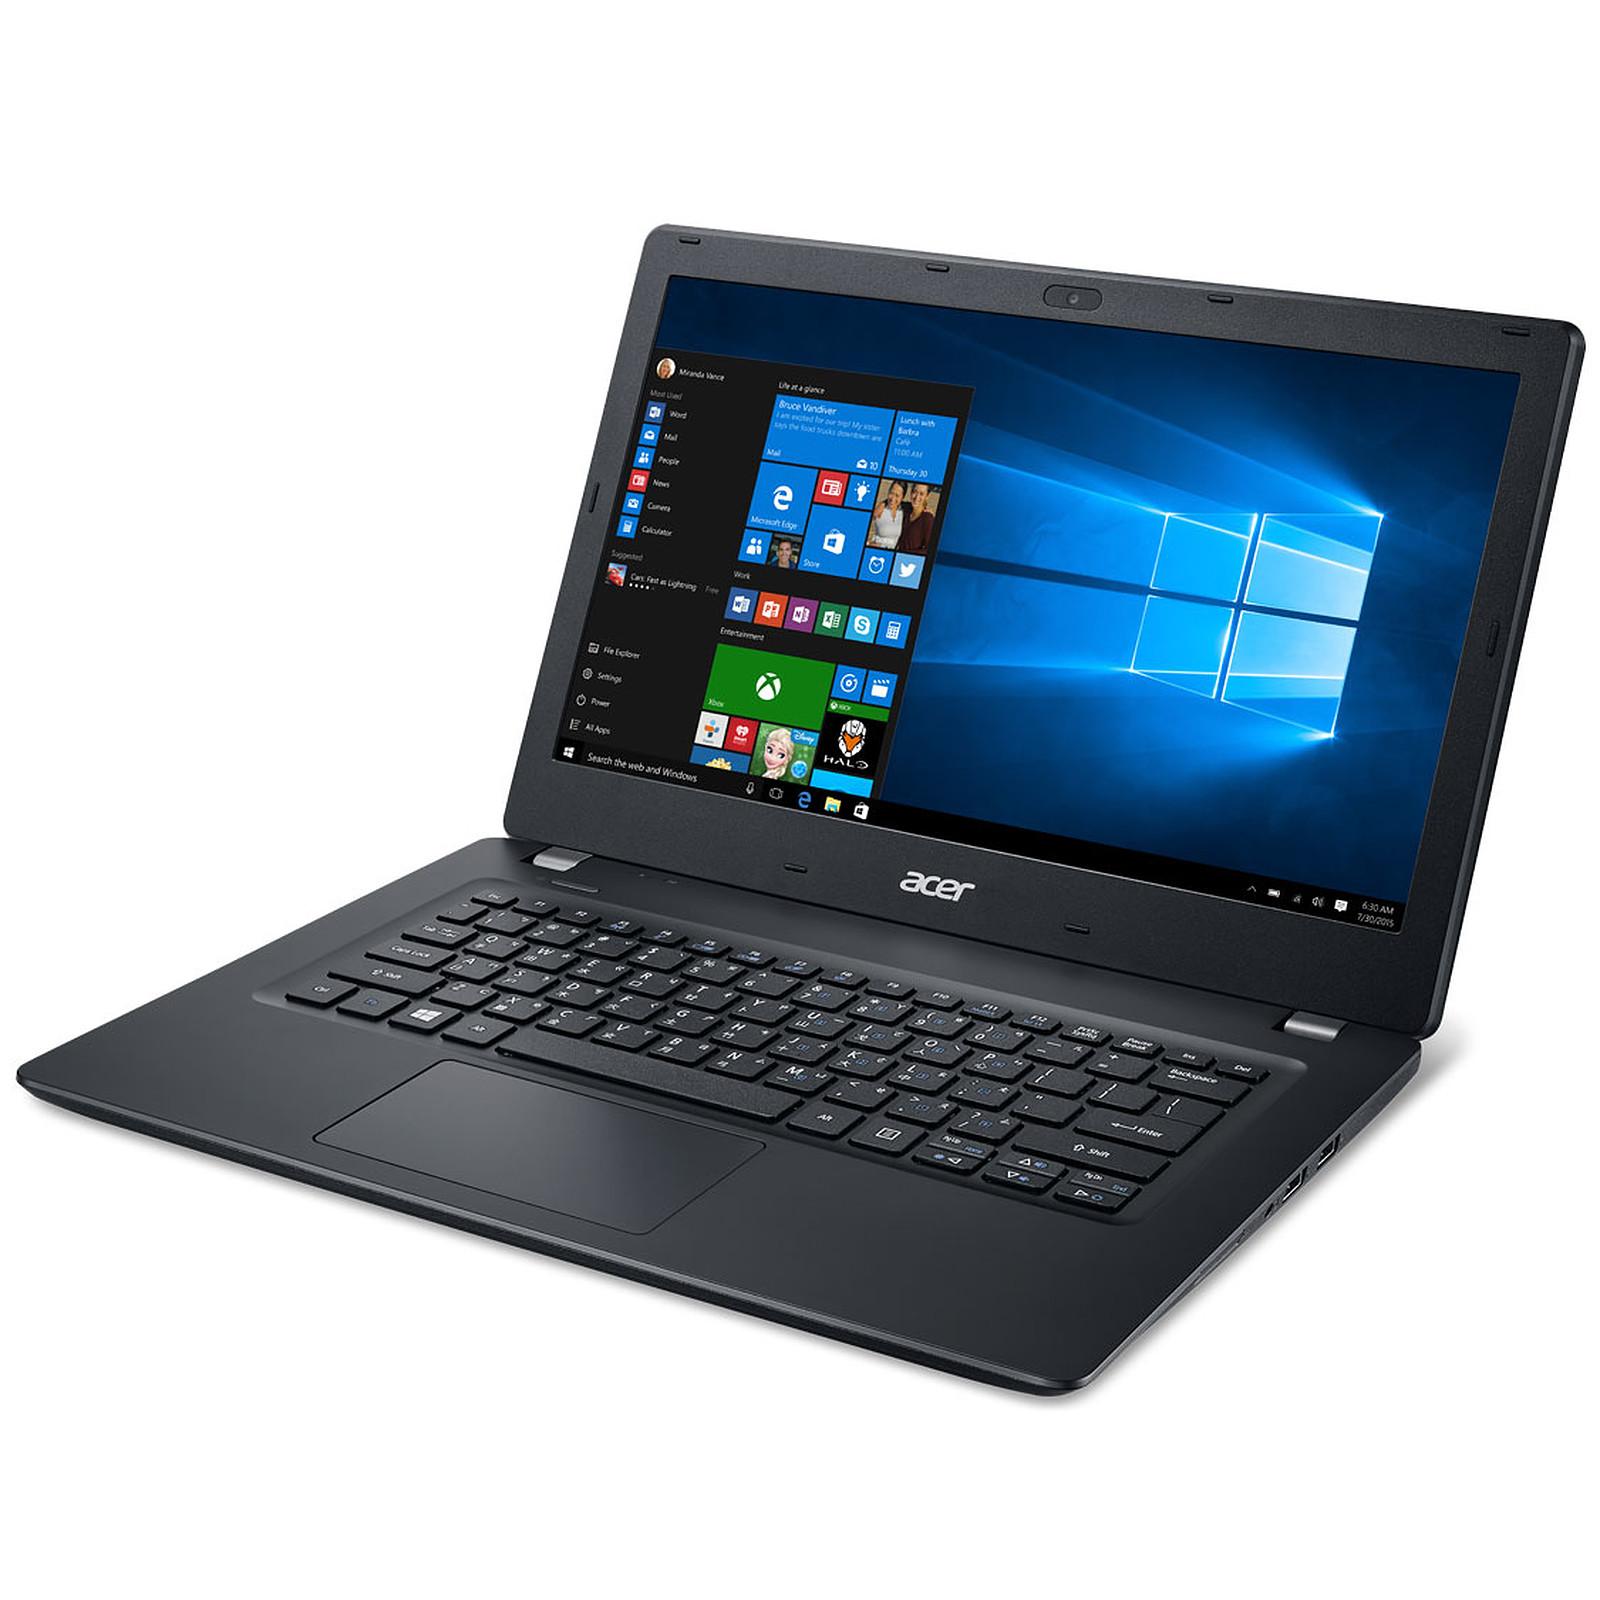 Acer TravelMate P238-M-54XJ